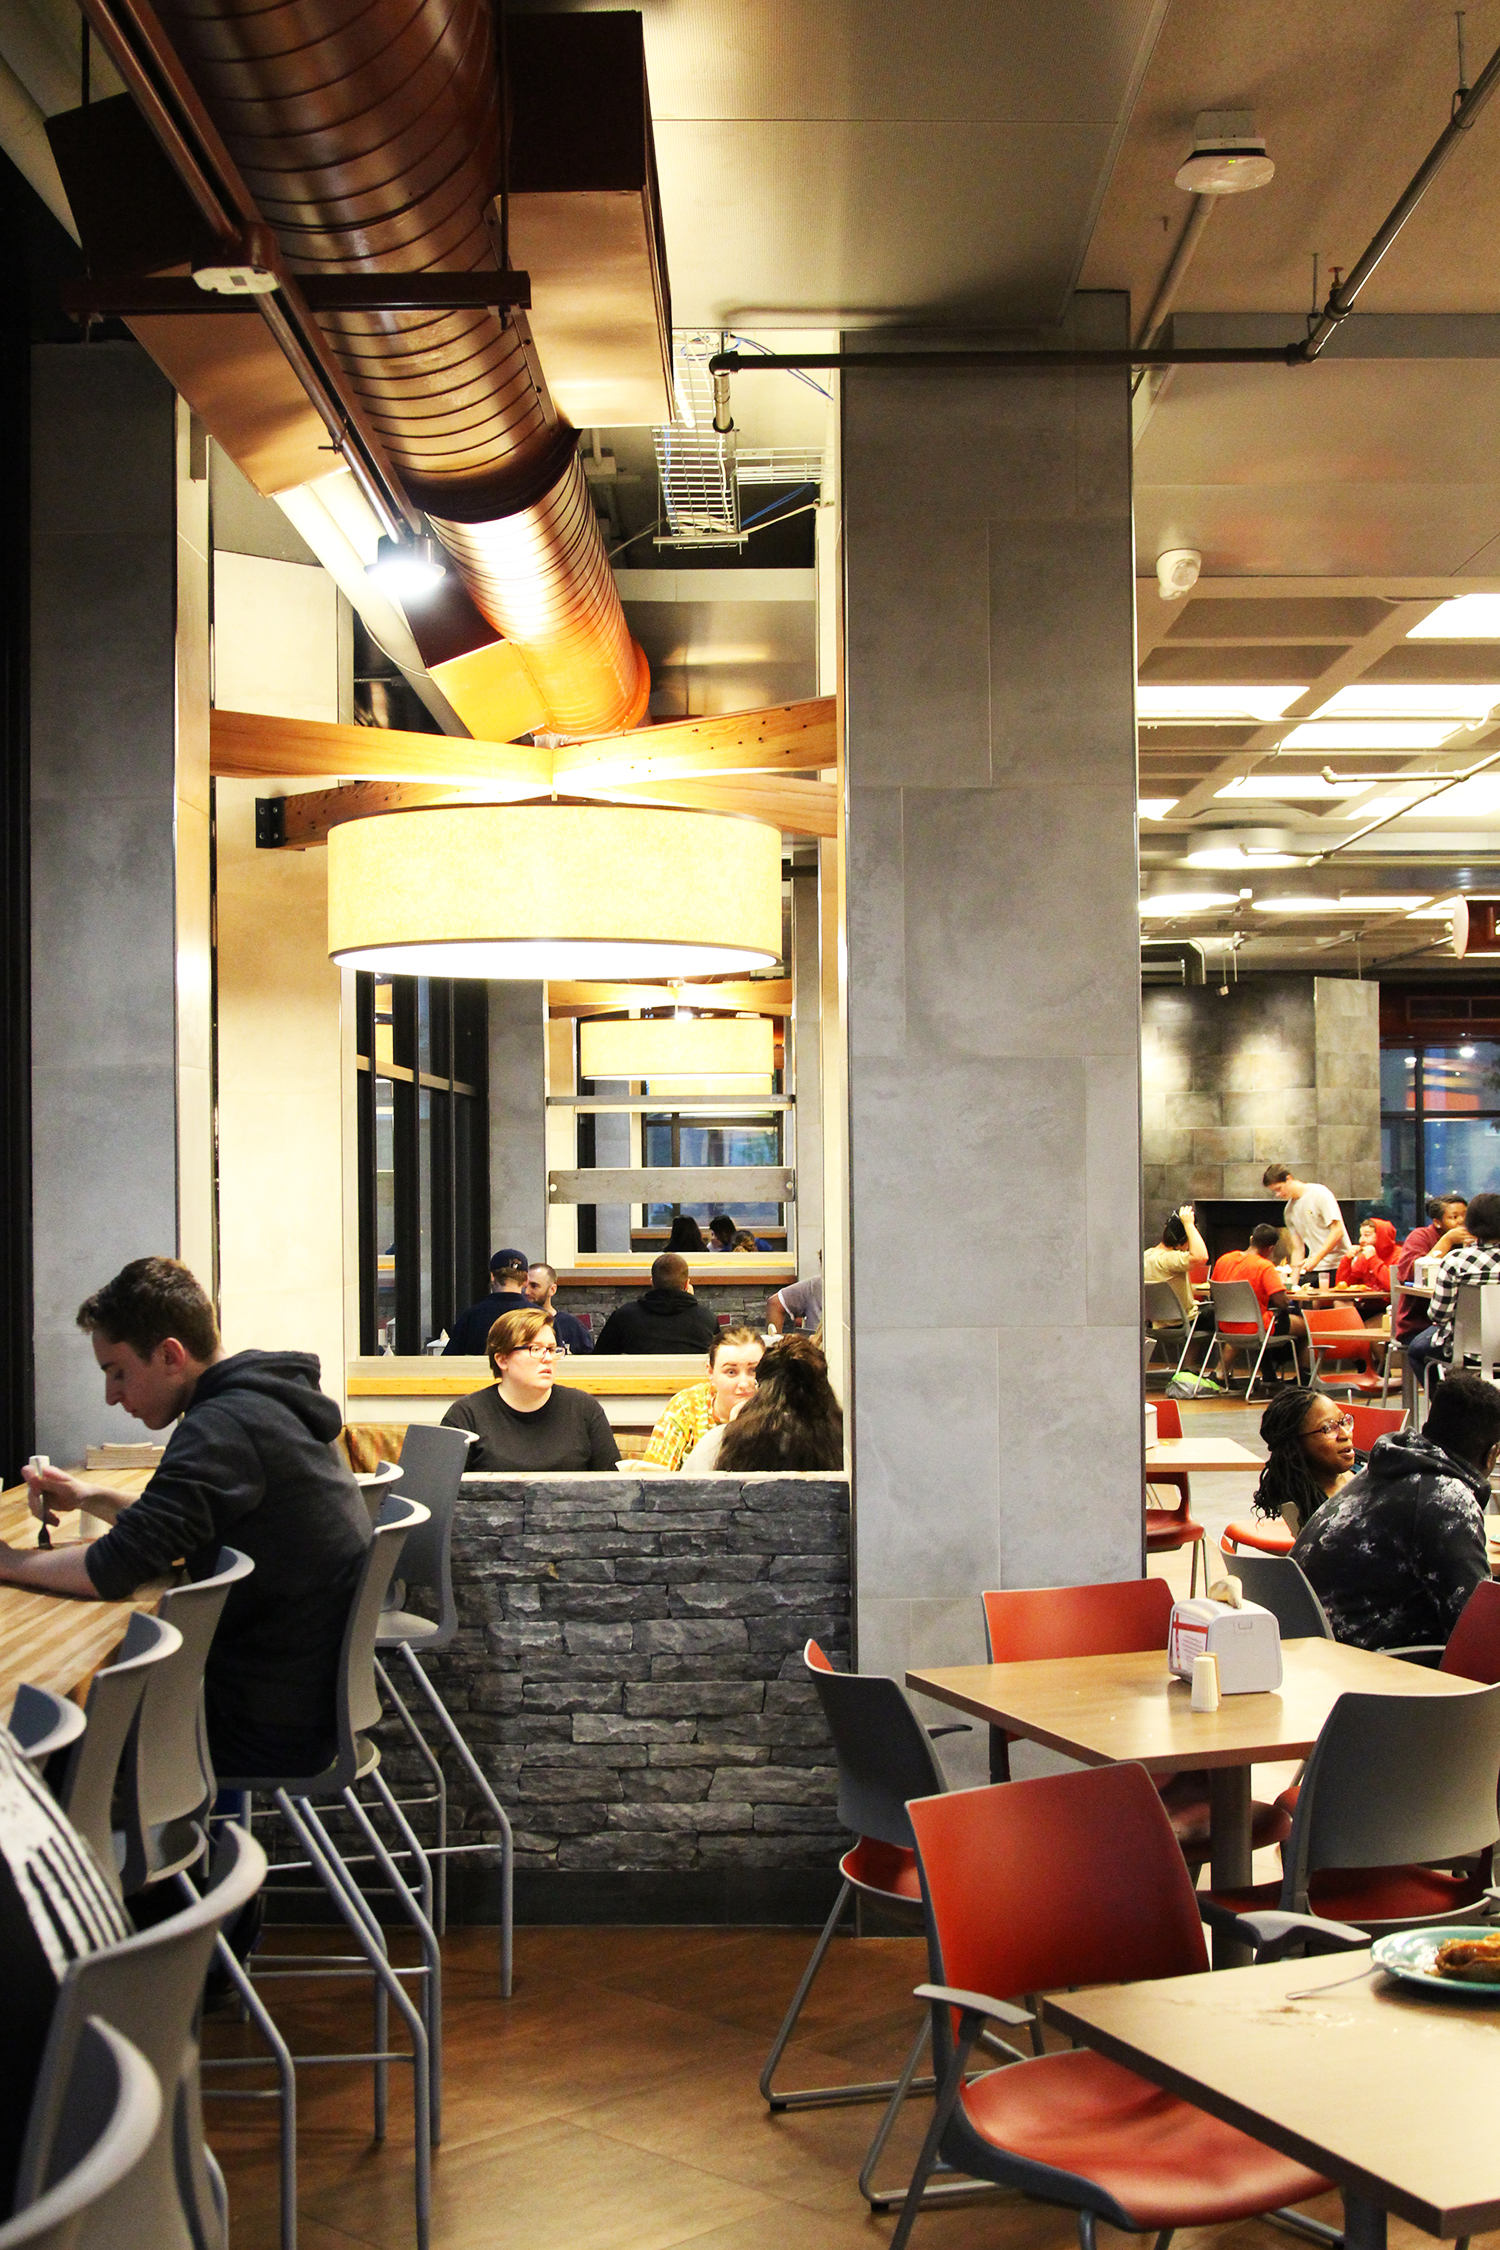 clinton dining hall_02.jpg